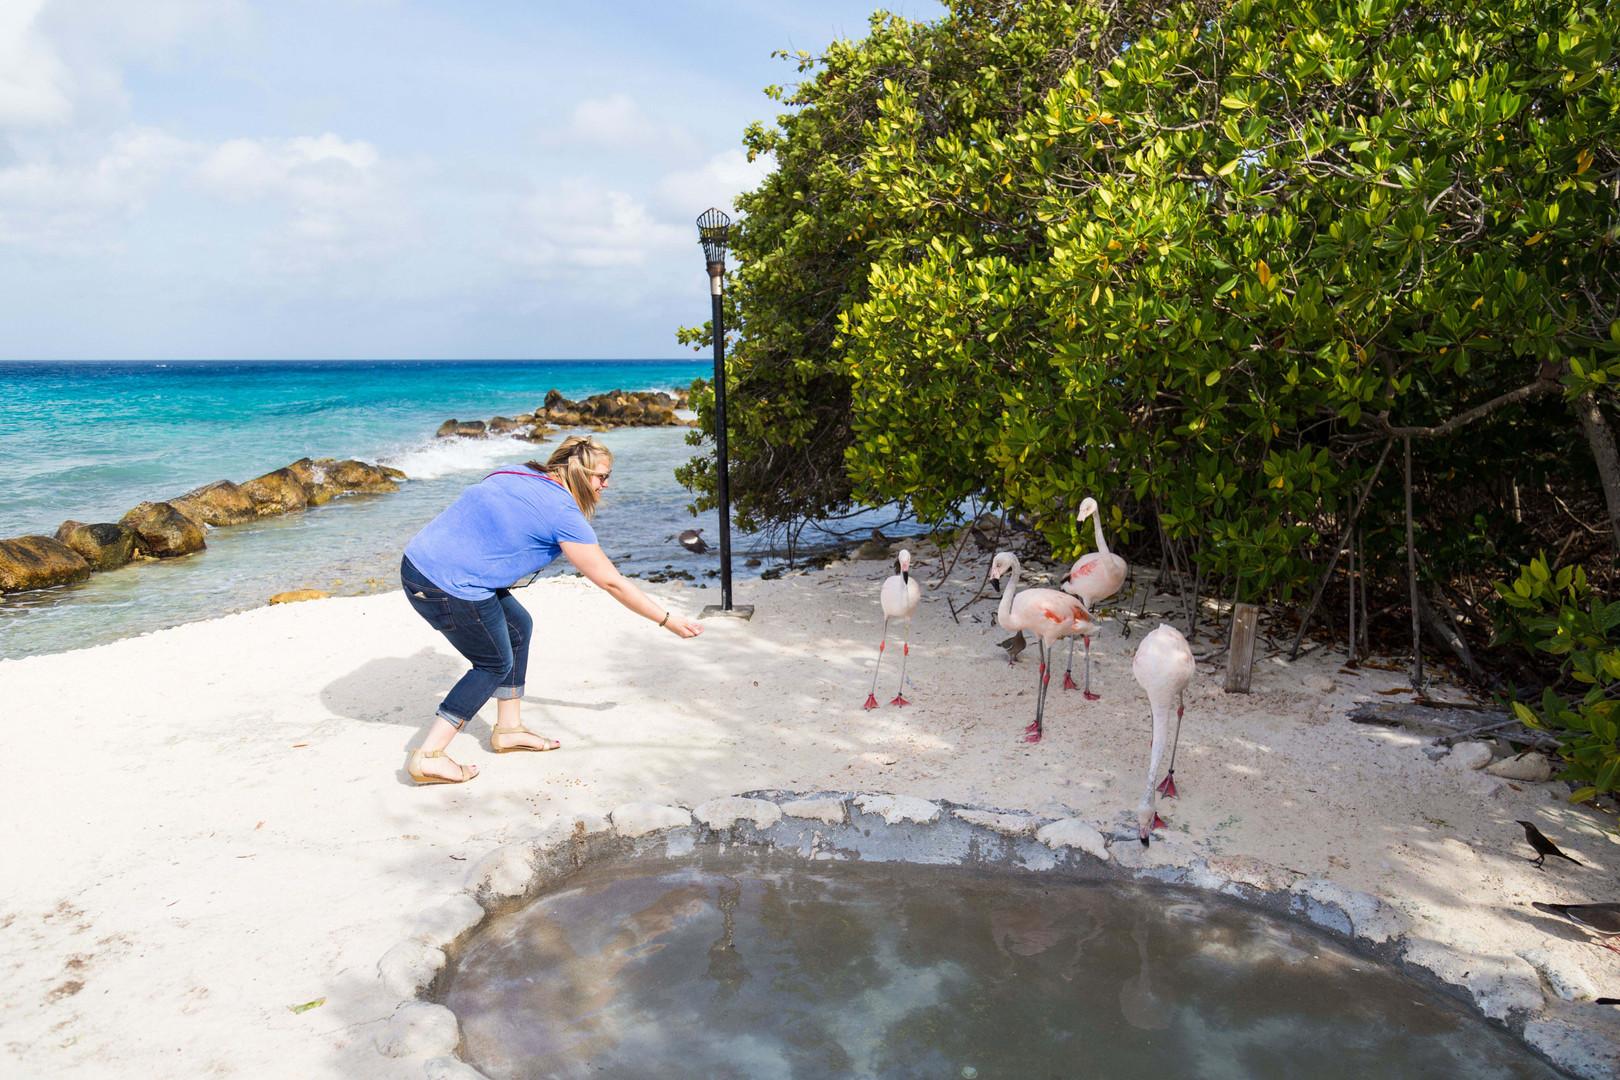 Aruba_Renaissance_Island_3.jpeg